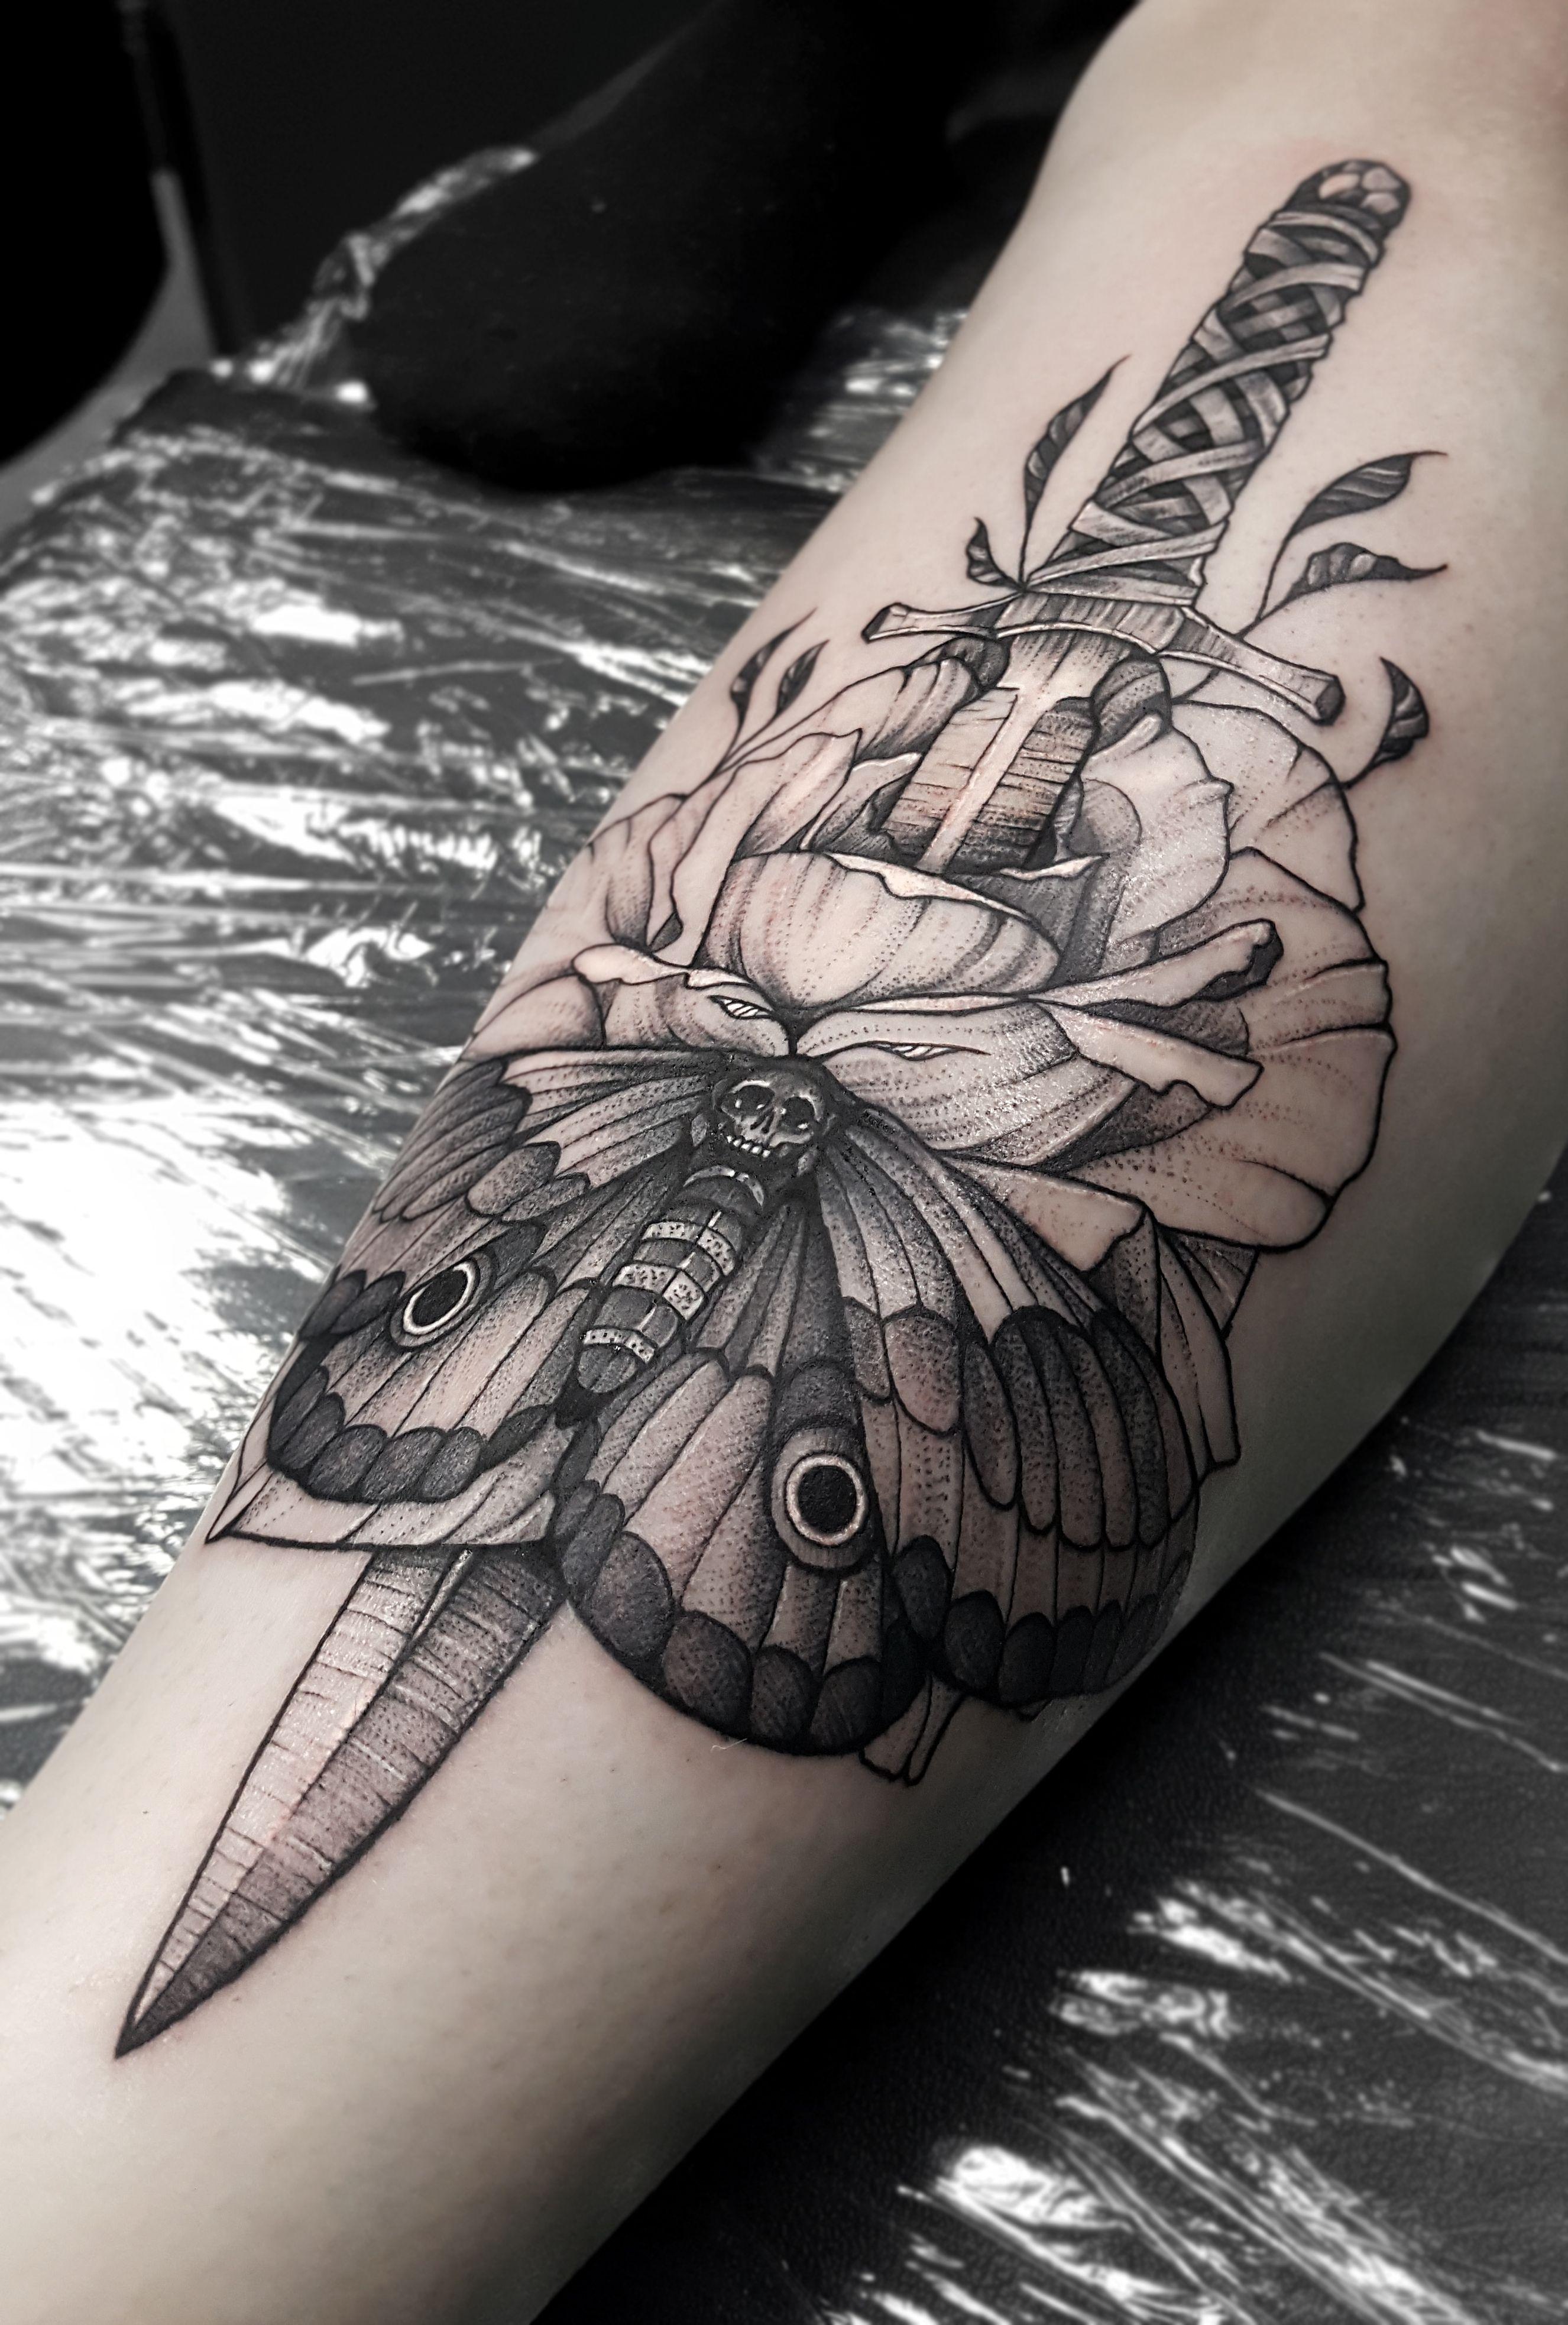 Blackwork Dolch Motte Rose Tattoo Tattoos Blackwork Tattoo Rose Tattoos